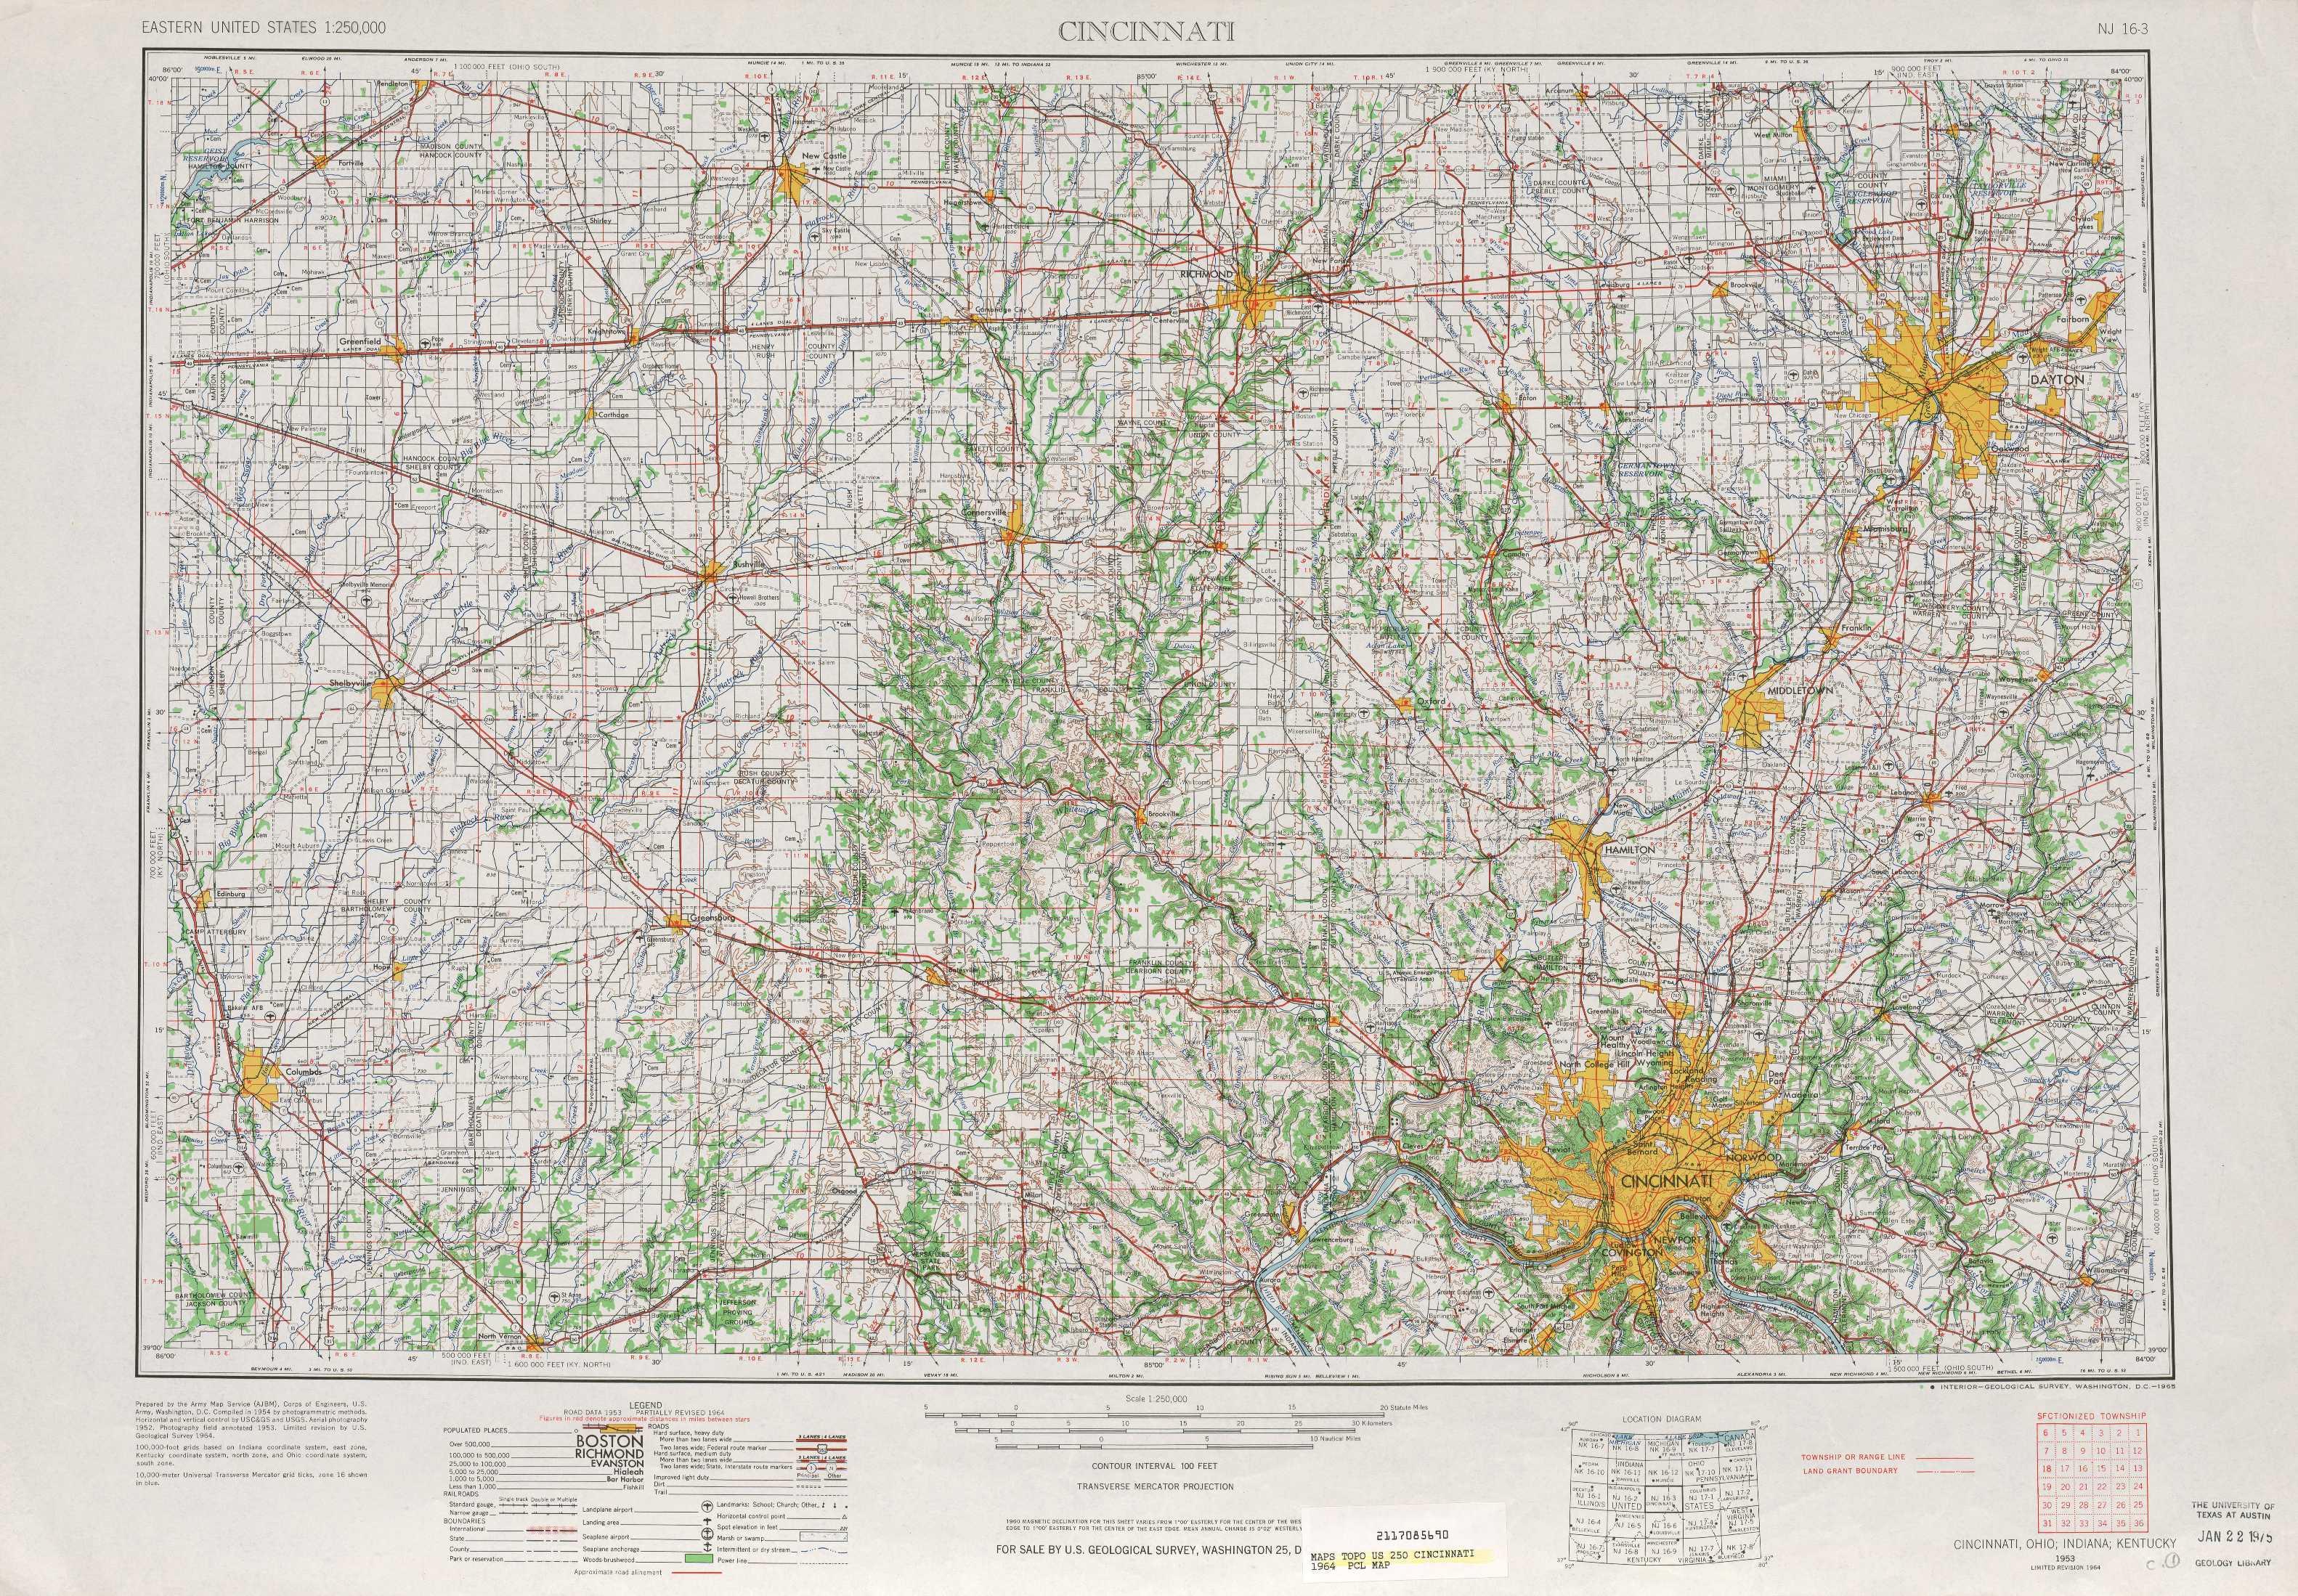 Cincinnati Topographic Maps, In, Oh, Ky - Usgs Topo Quad 39084A1 At - Printable Cincinnati Map